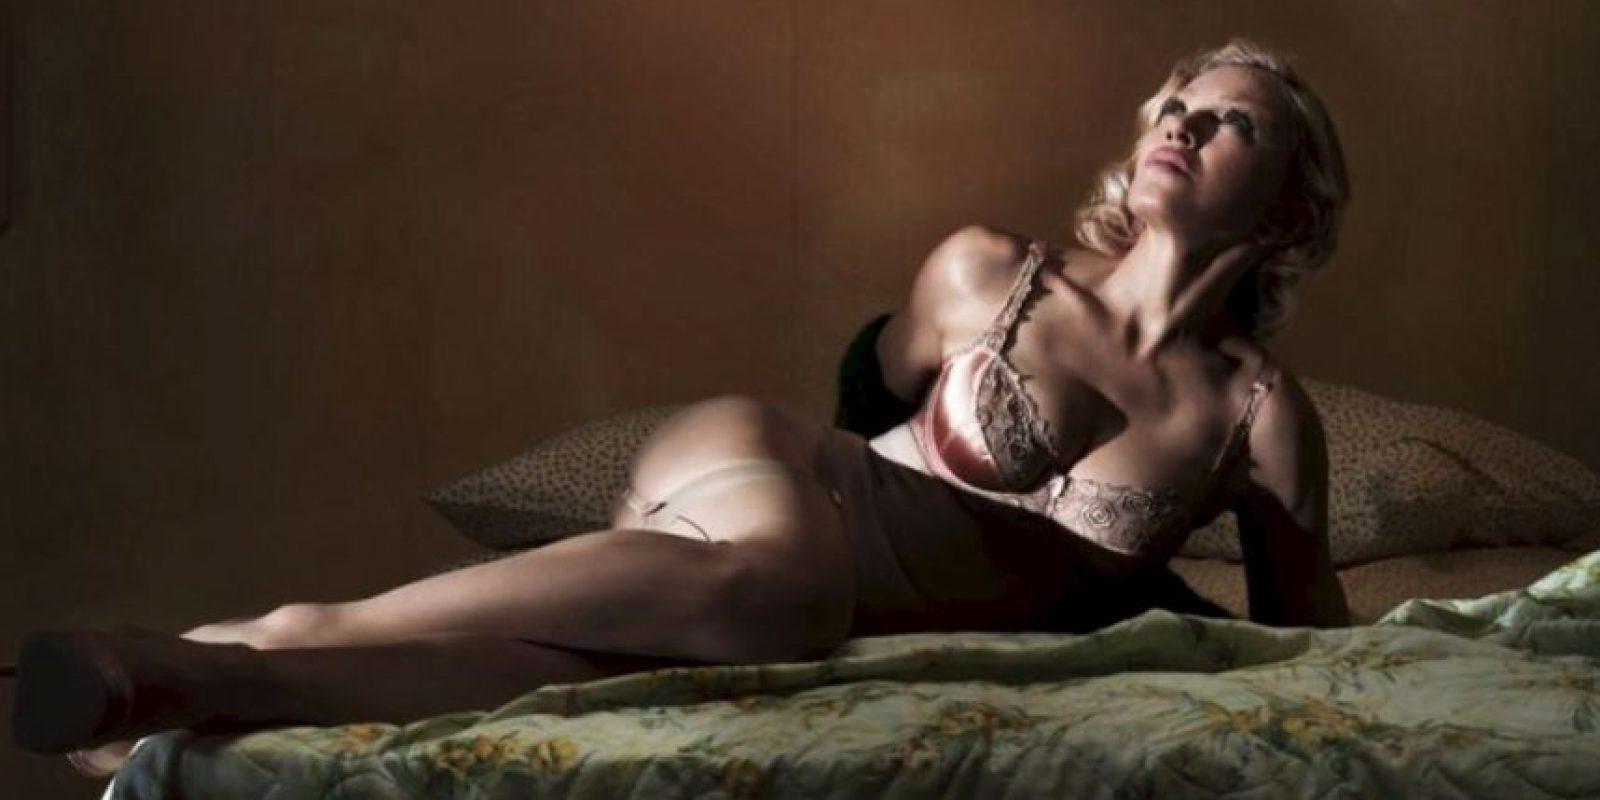 Foto:Interviewmagazine.com